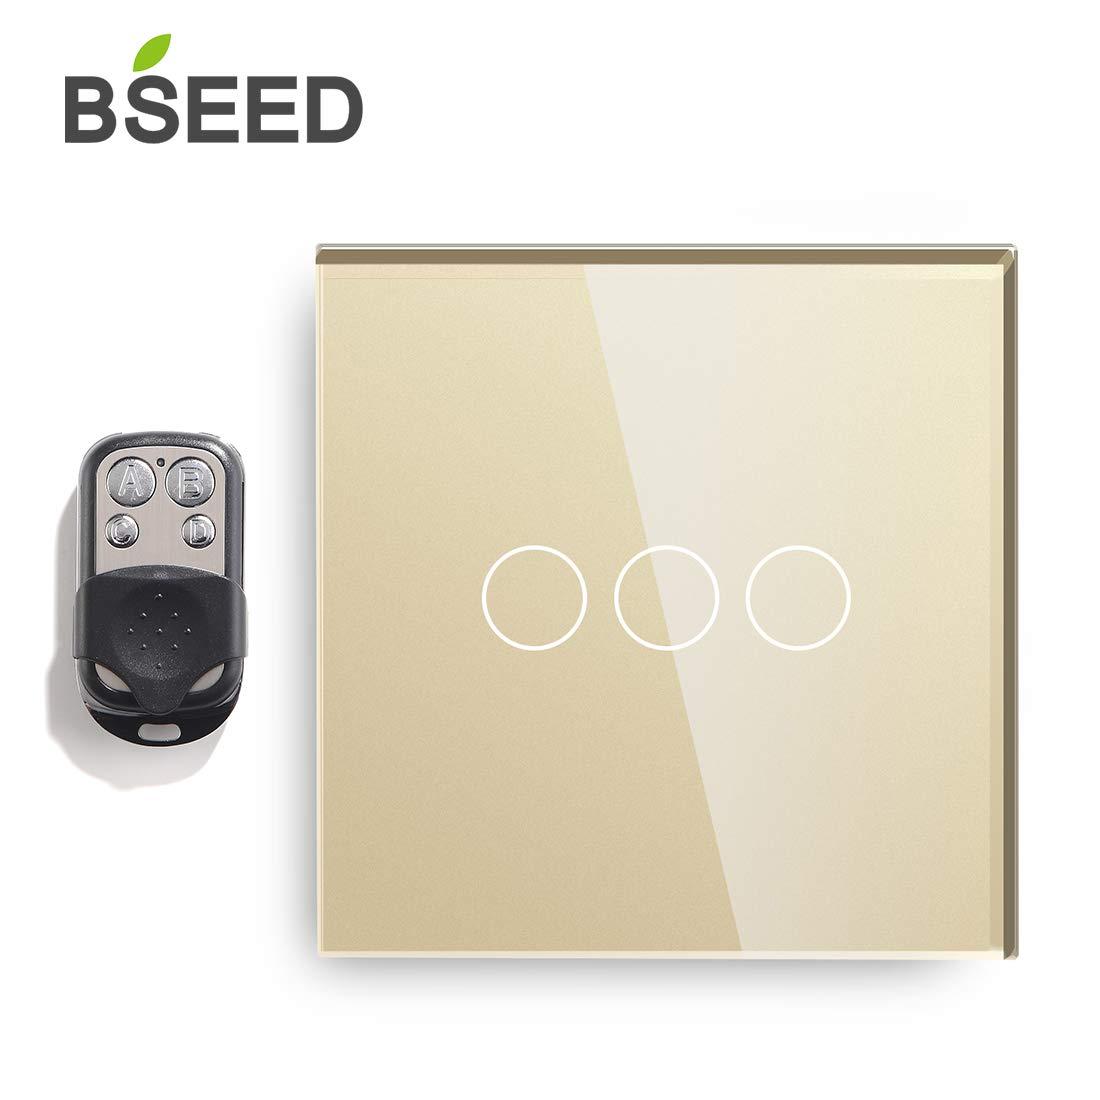 BSEED interruptor luz pared 3 Gang 1 Way interruptor tactil pared blanco interruptores de luz pared con pantalla t/áctil de vidrio